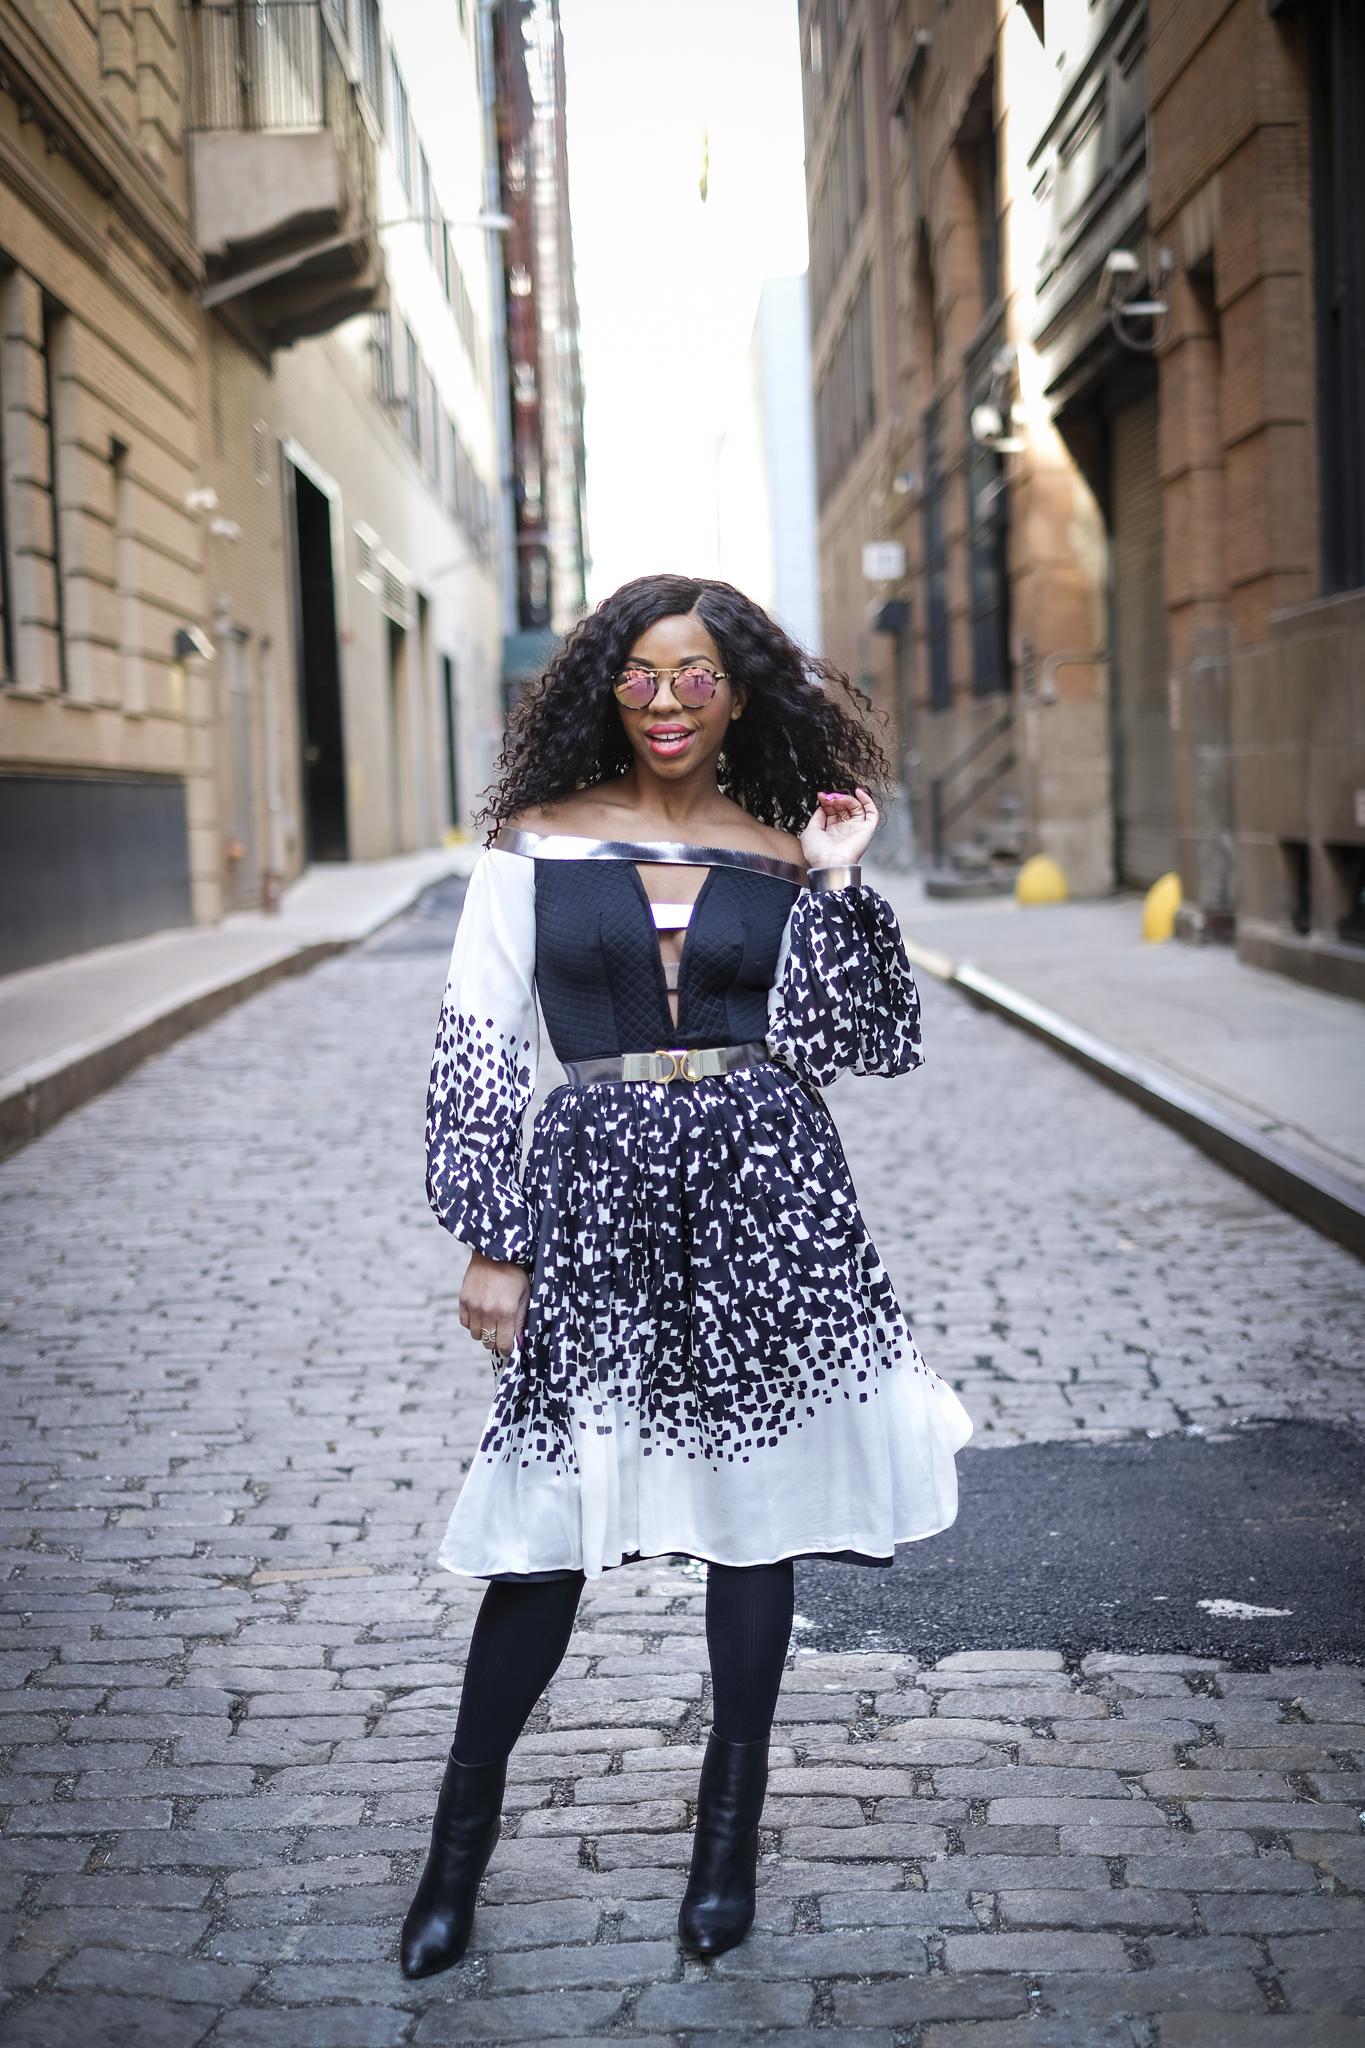 Fashion Week Outfit Ideas